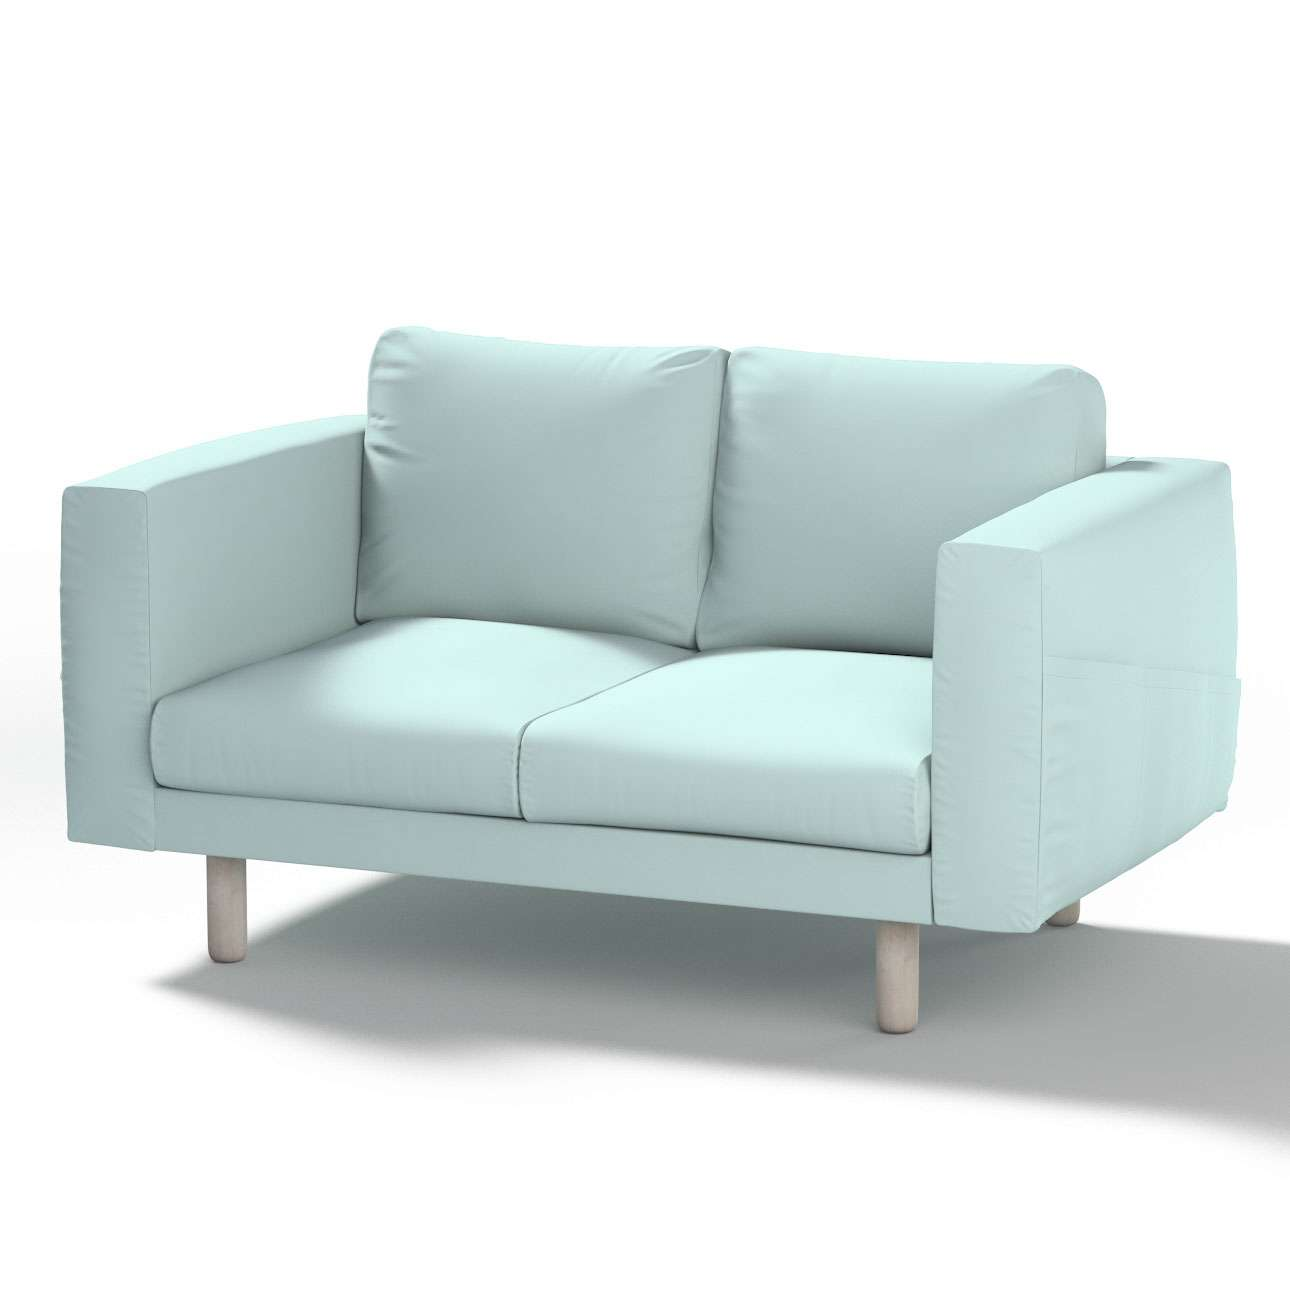 Norsborg 2 Seat Sofa Cover Pastel Blue 702 10 Norsborg